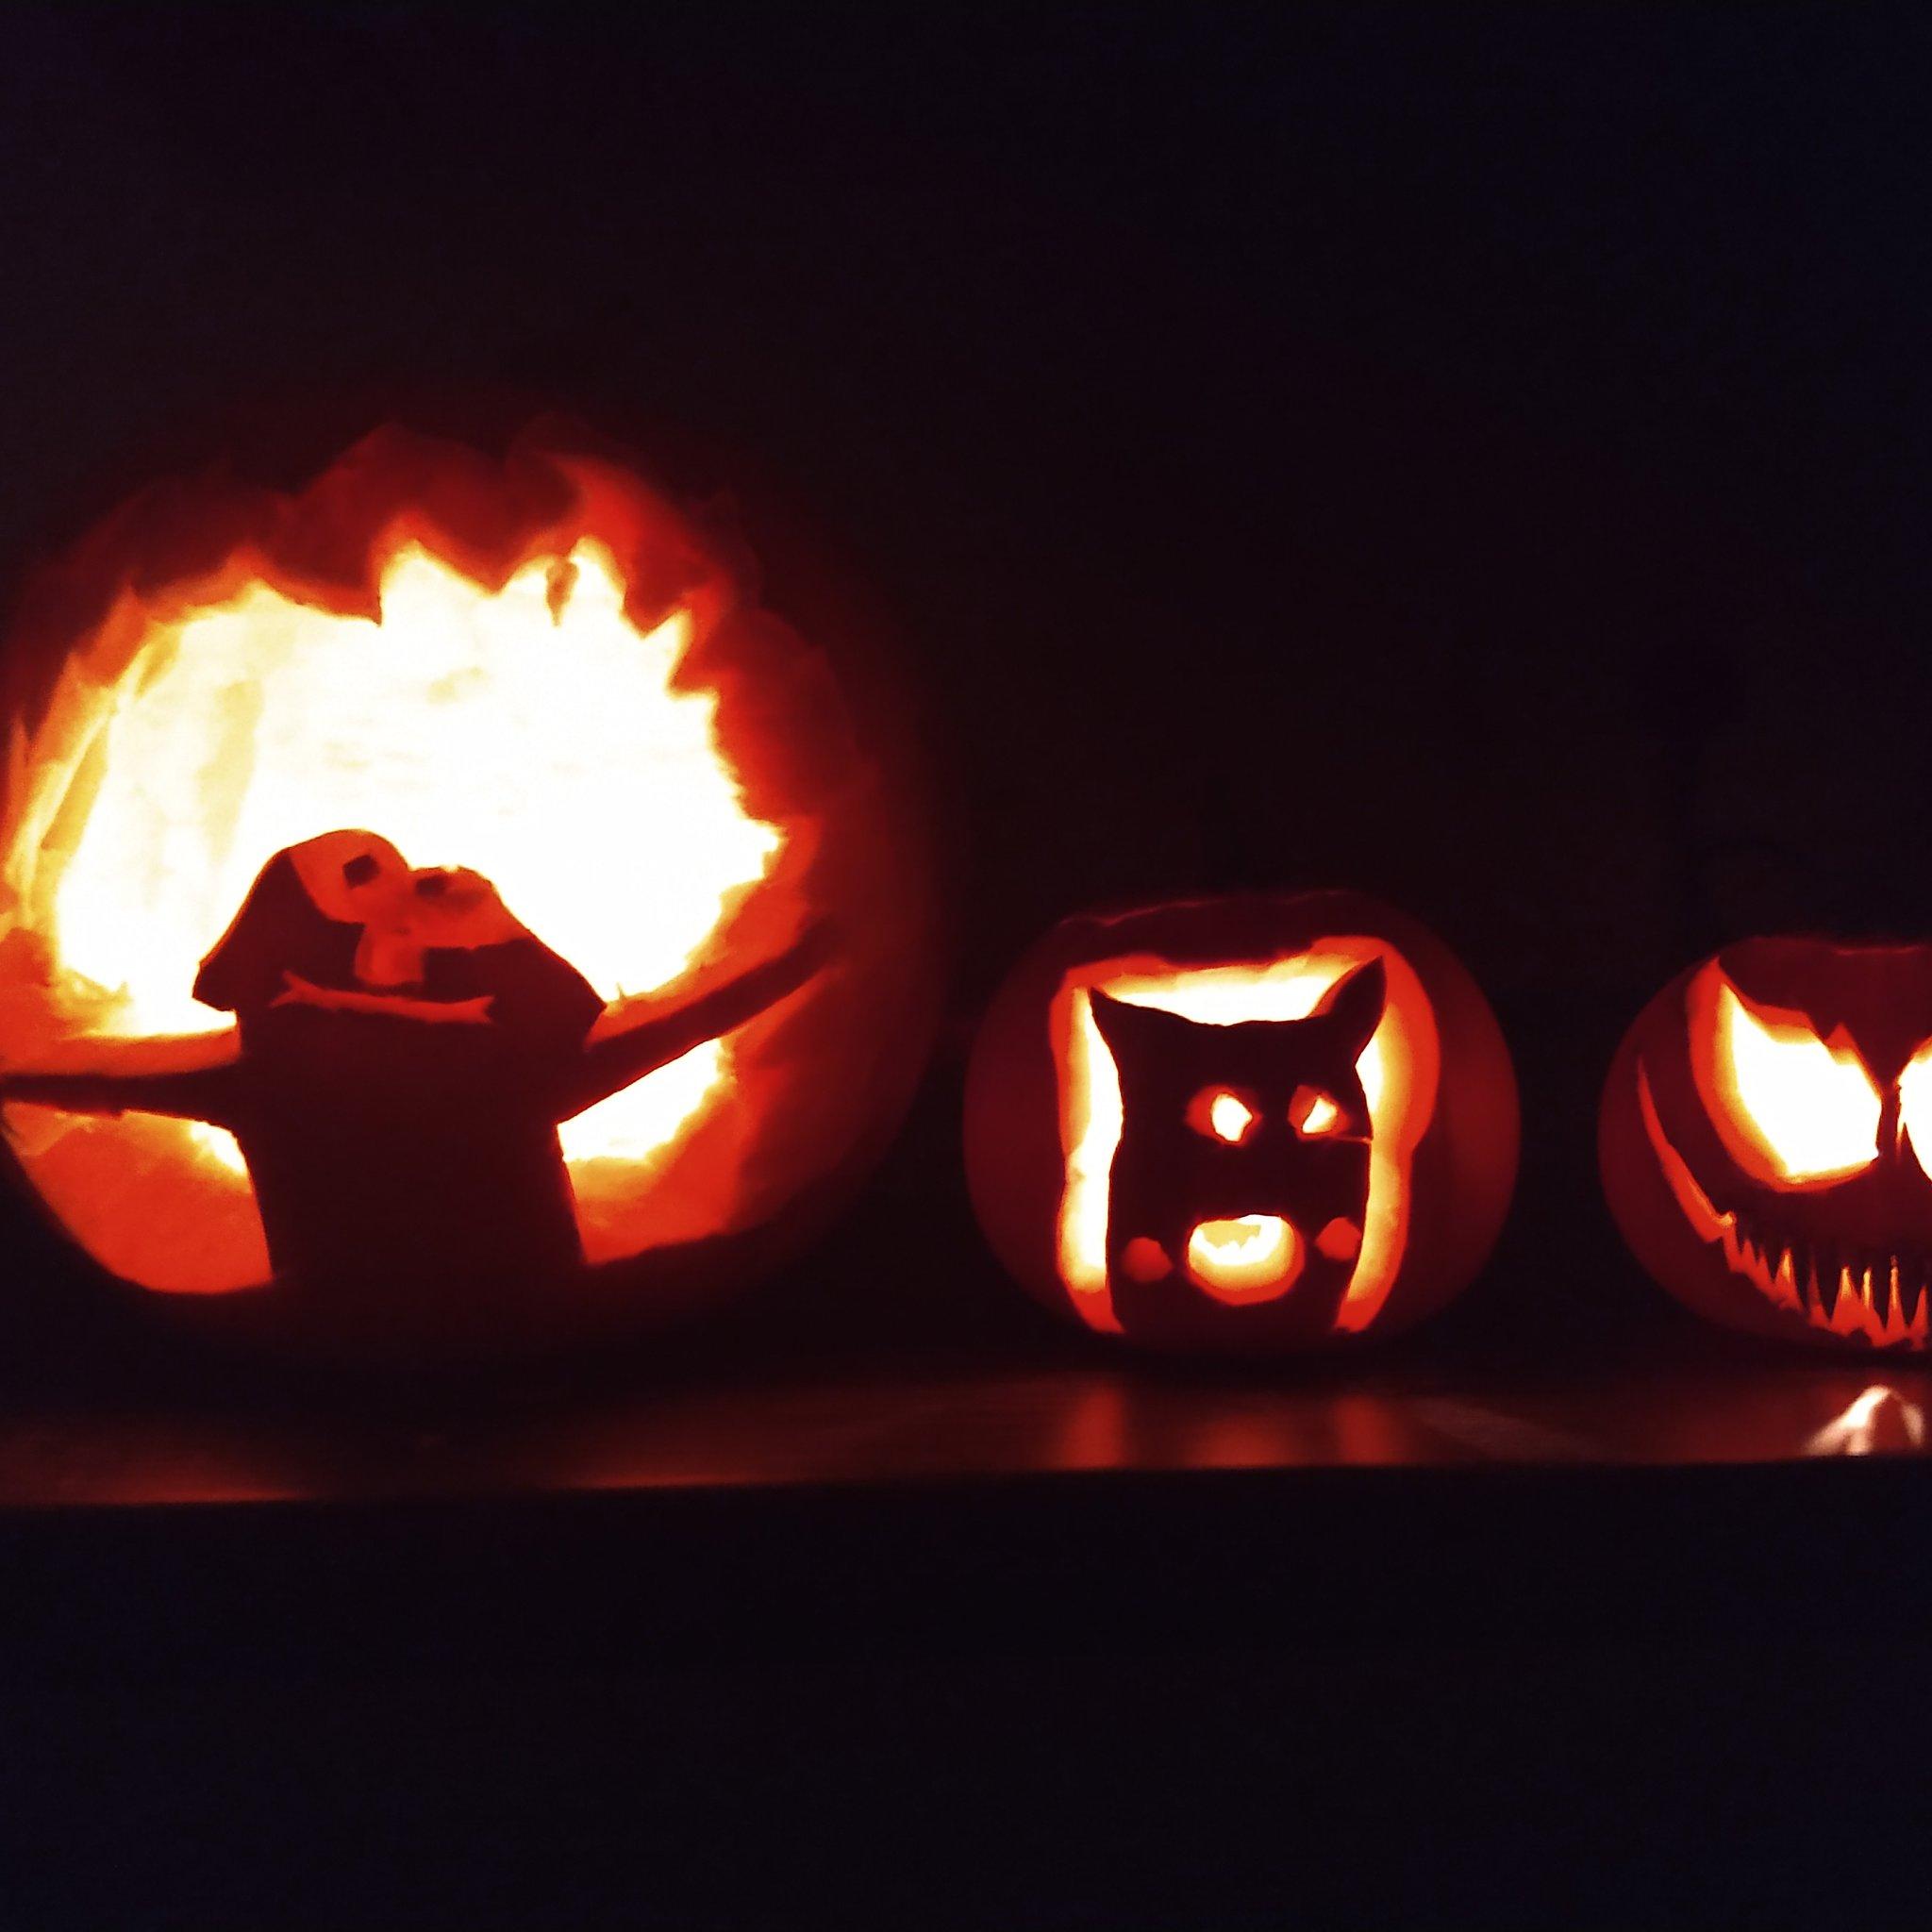 Emily Reynolds On Twitter Pumpkin Carving Night Elmo Pikachu Venom Halloween